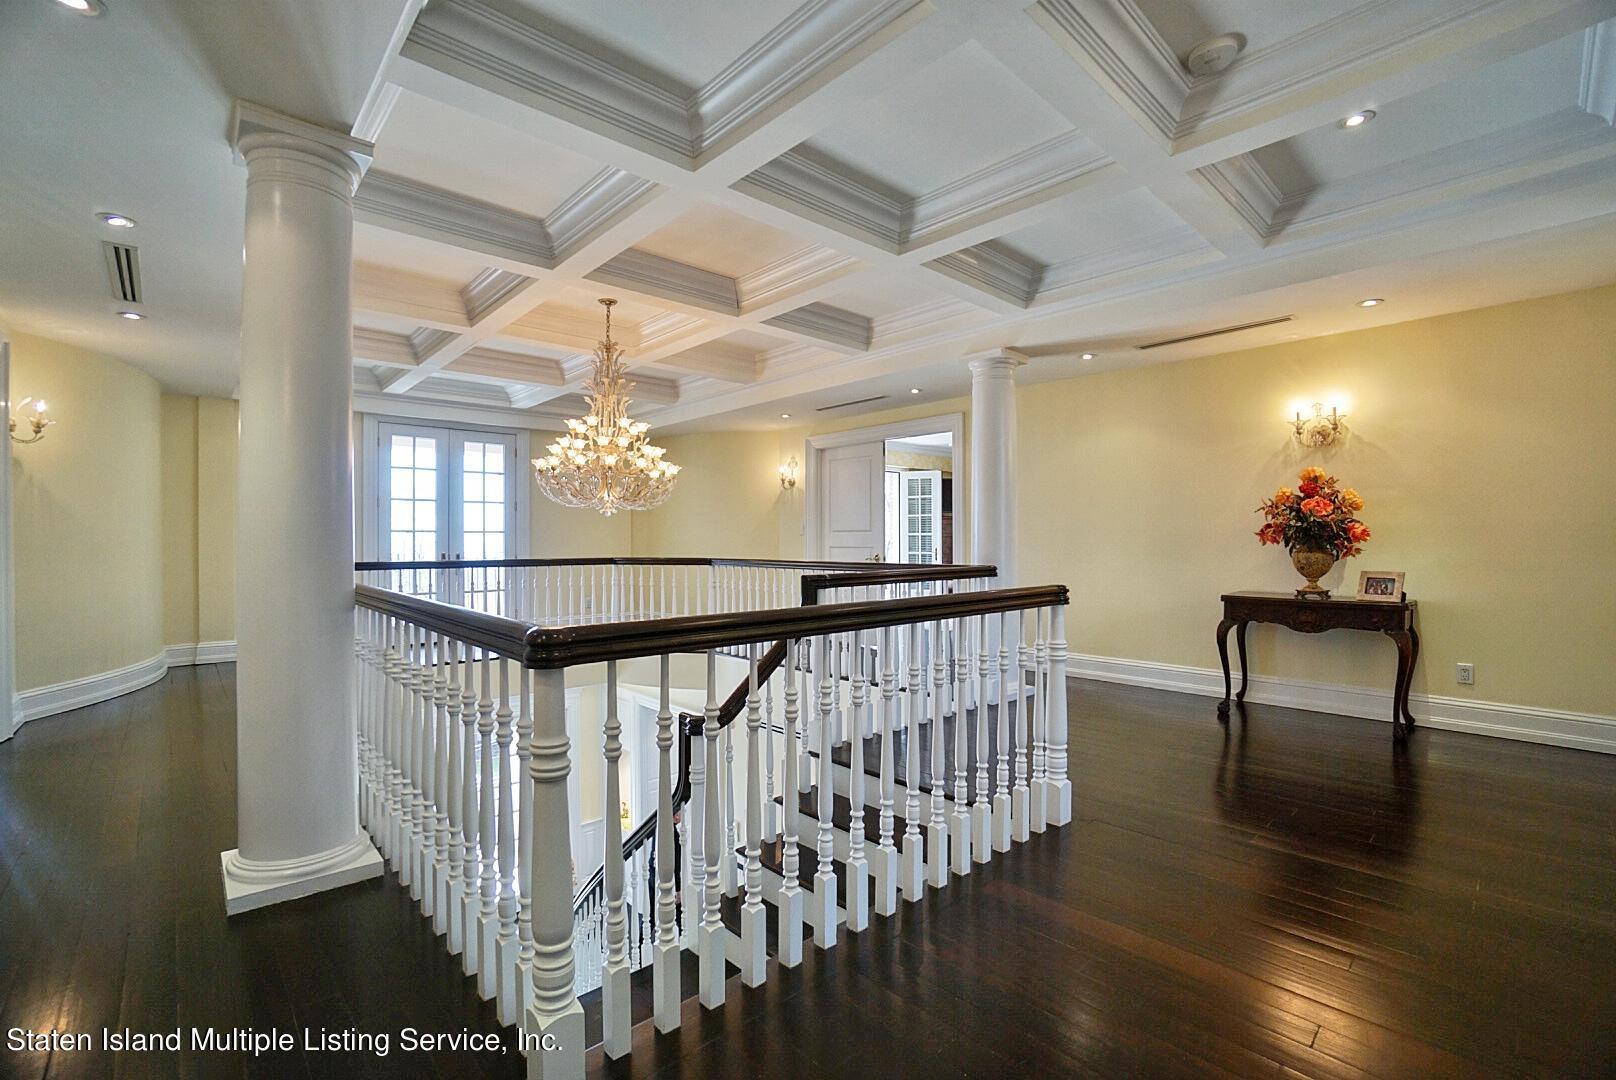 Single Family - Detached 129 Coverly Avenue   Staten Island, NY 10301, MLS-1144490-33